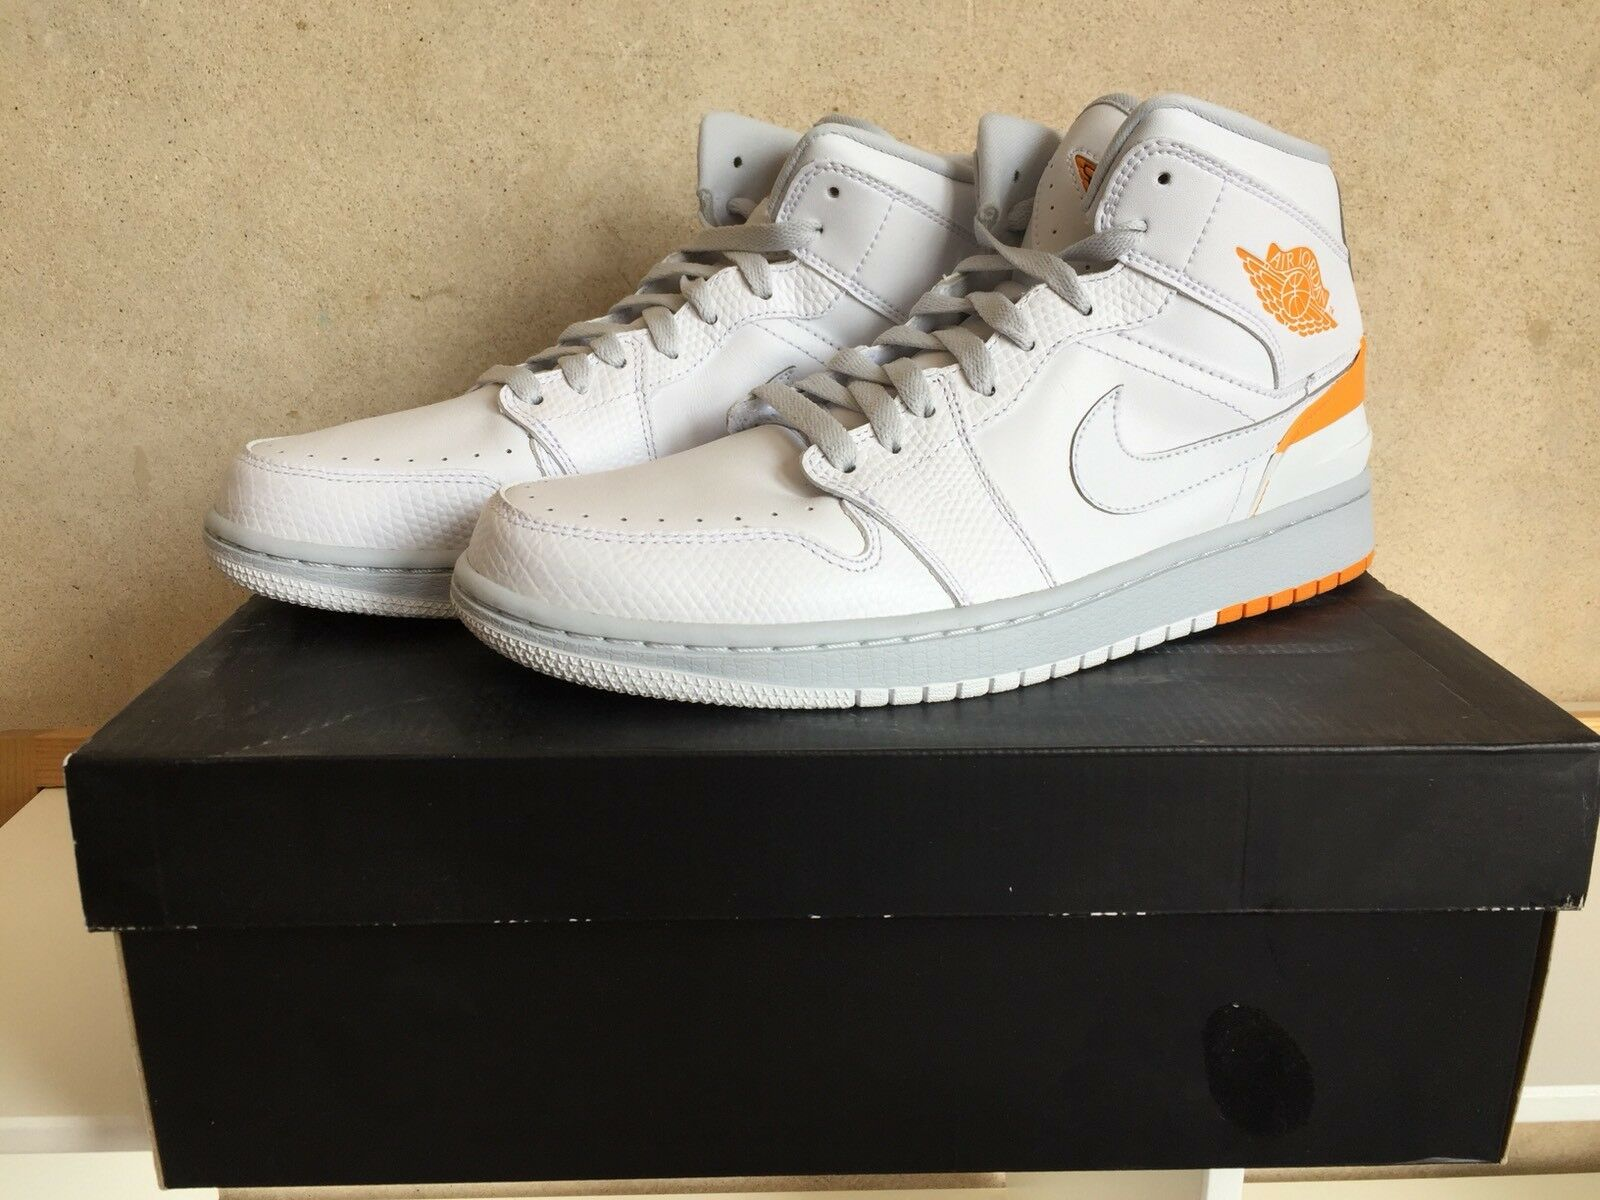 Nike air jordan 1 rtro 86 kumquat dimensioni limitate uk8 us9 nuova chiusi